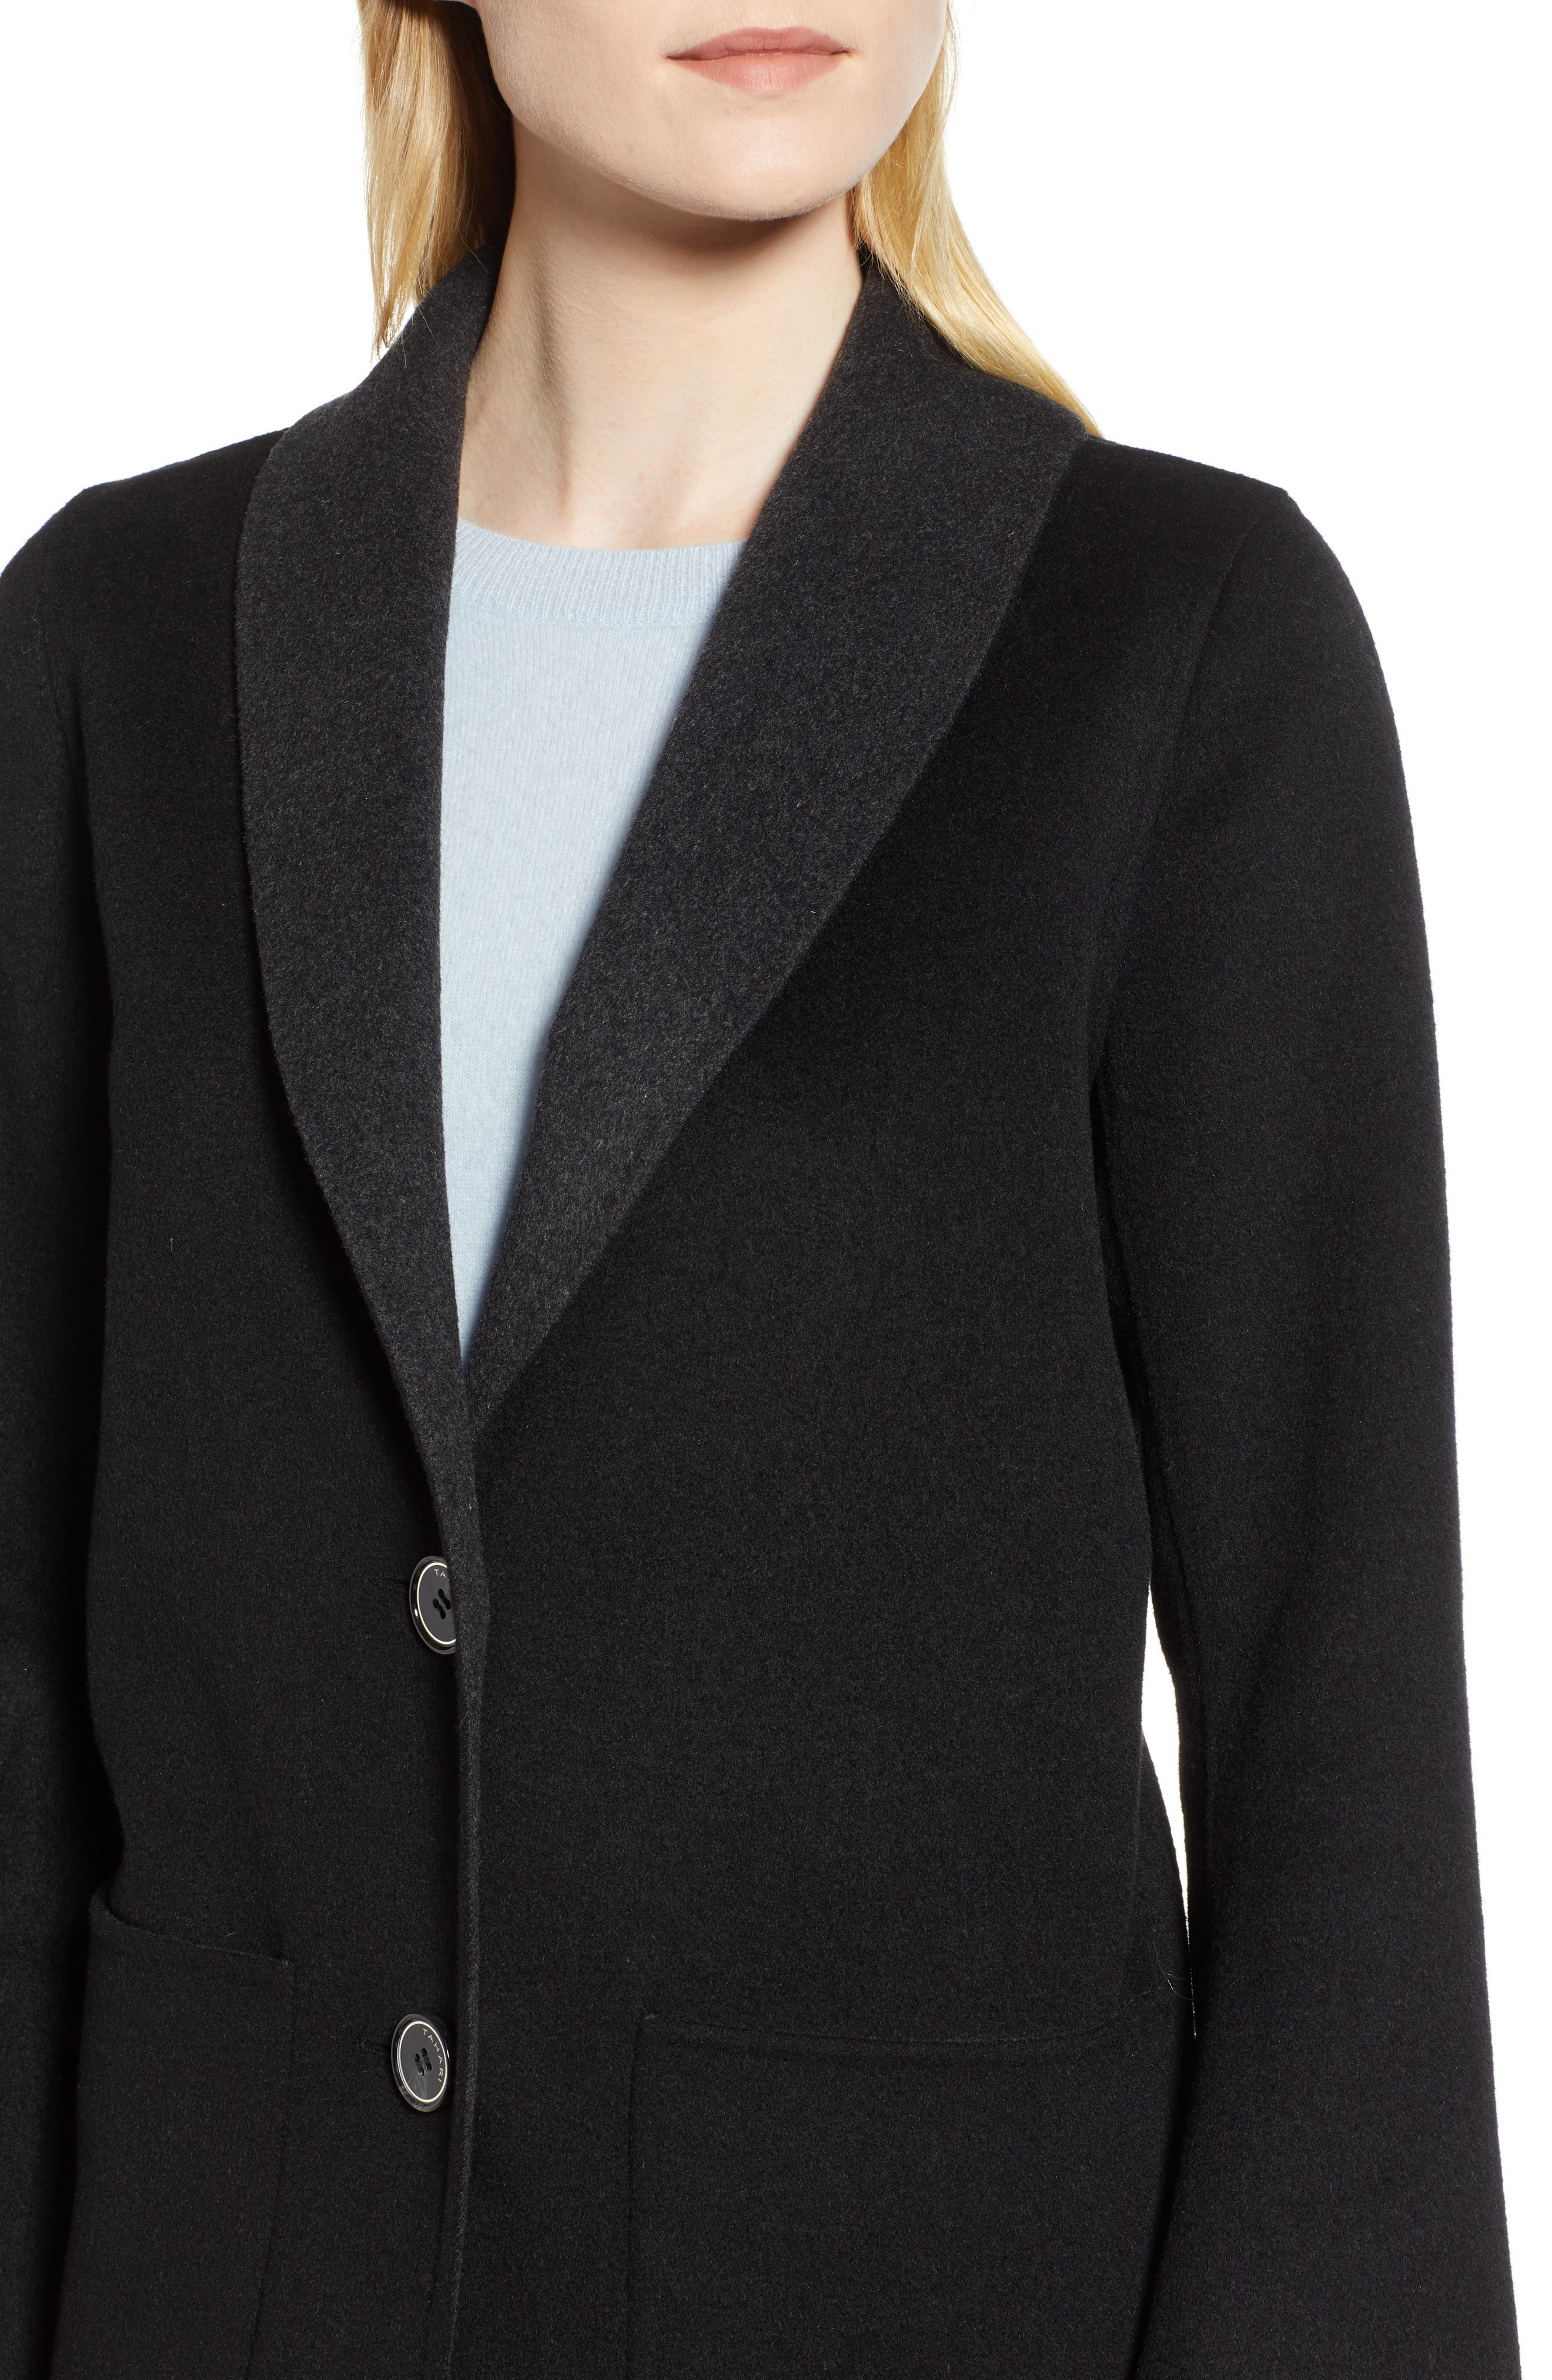 Jenn Double Face Wool Blend Reversible Coat,                             Alternate thumbnail 4, color,                             016